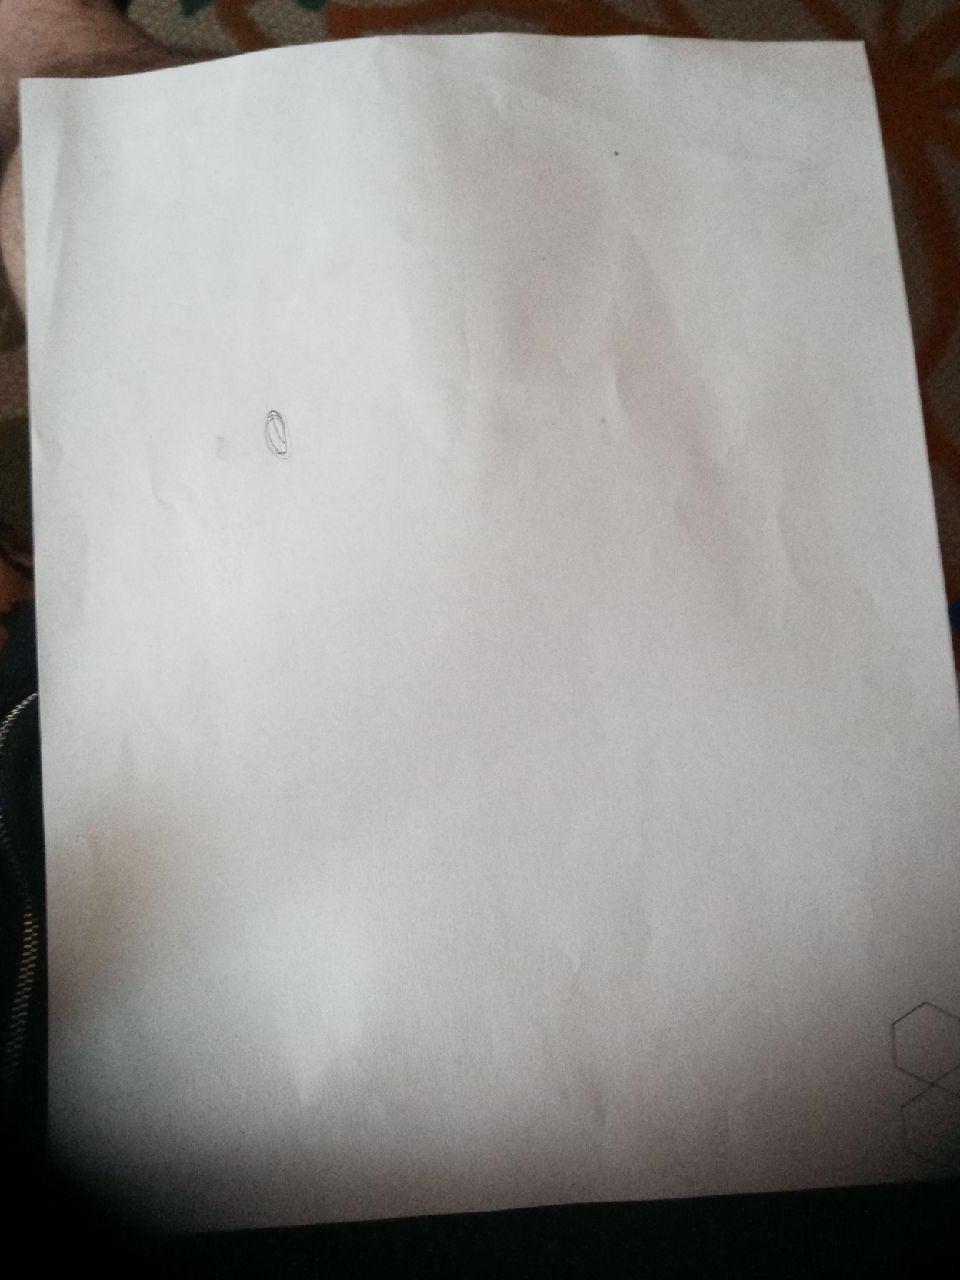 Piece ofnpaper